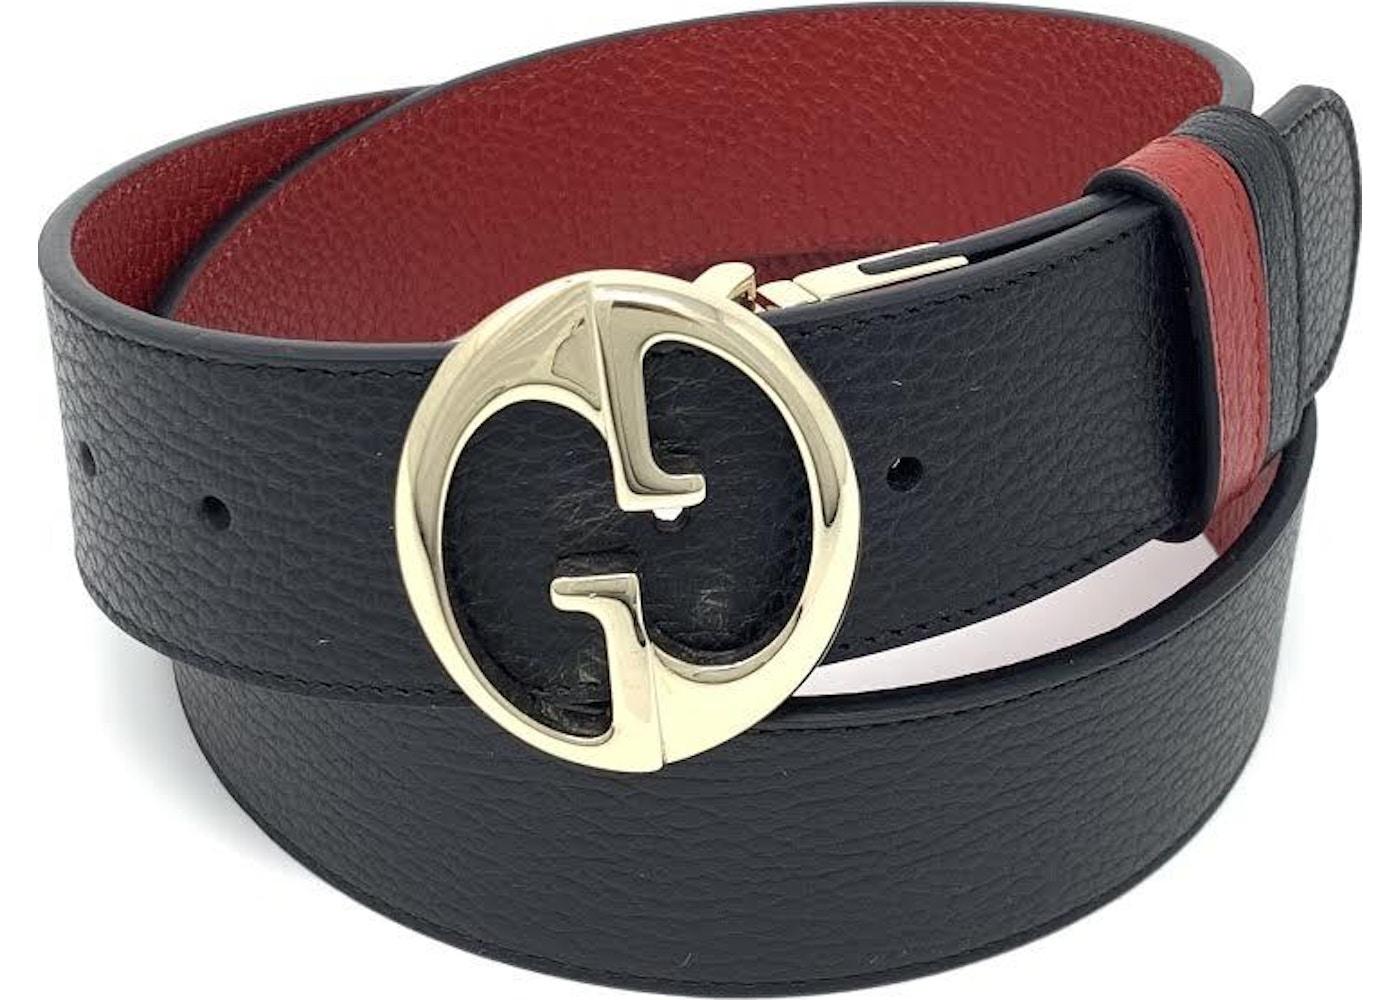 60e22b14111 Gucci Interlocking G Reversible Belt 1.75W Black Red. 1.75W Black Red